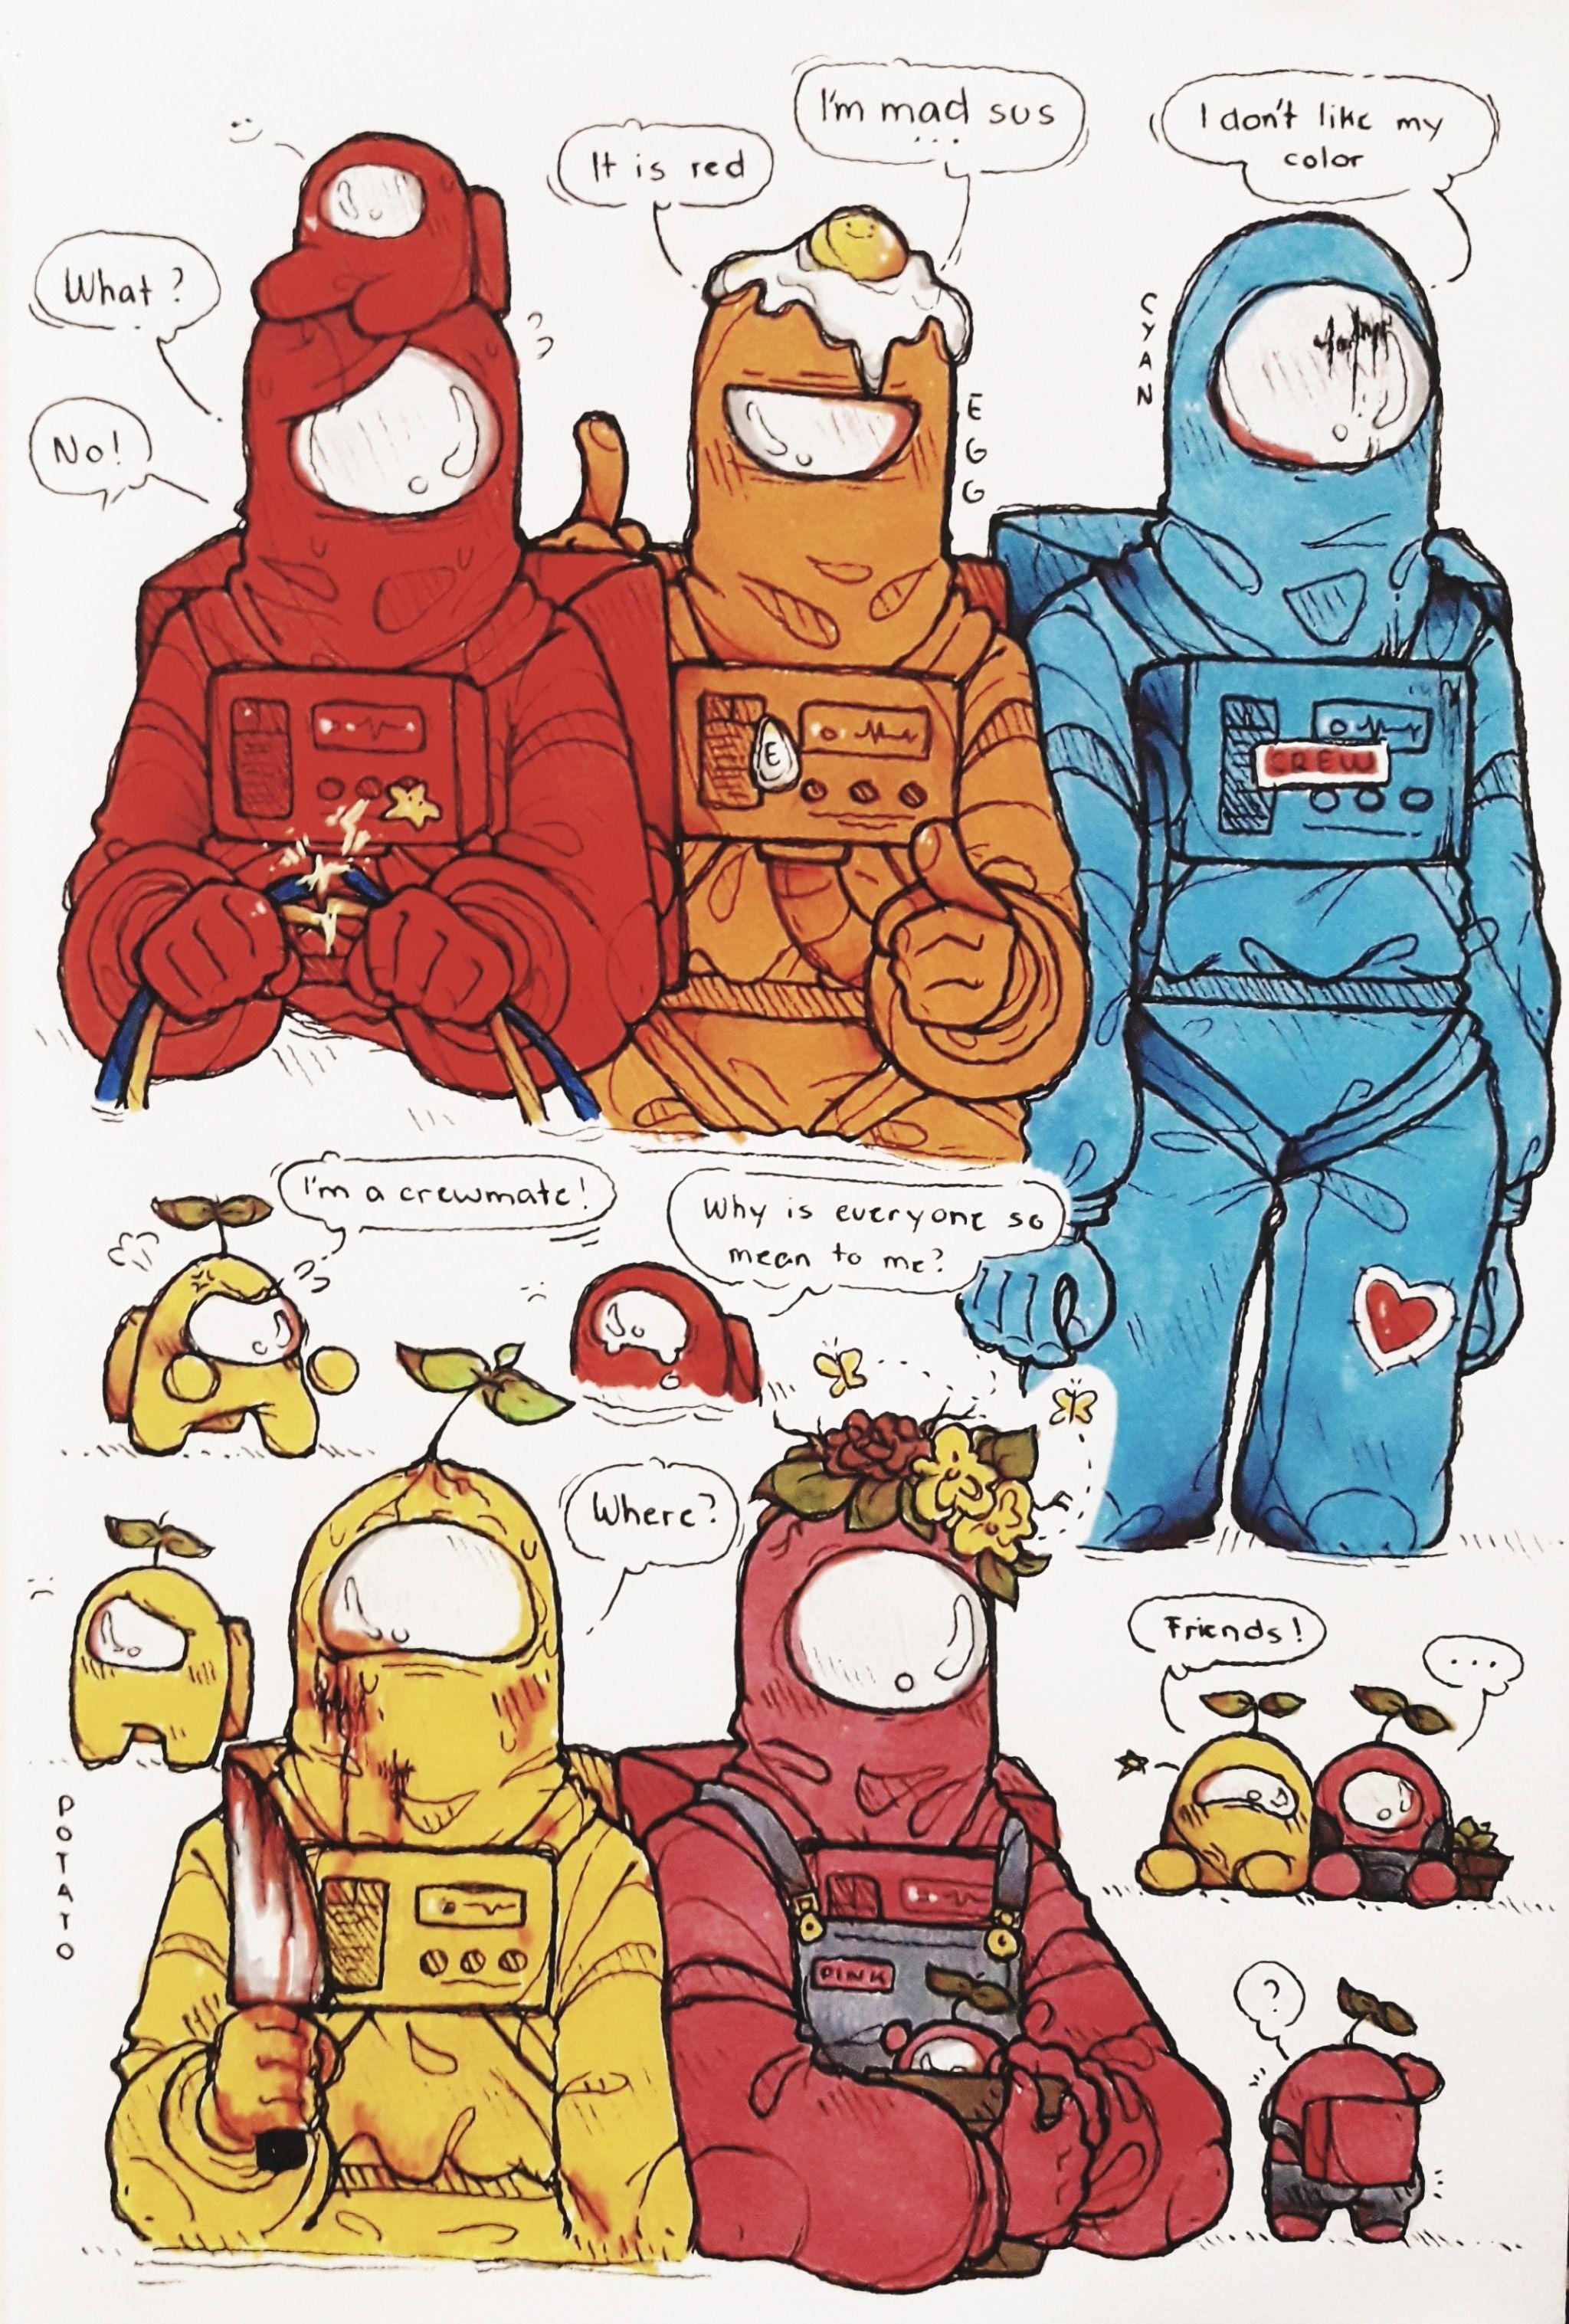 Pin By Maike P On Among Us In 2020 Cute Art Character Design Animation Cute Comics Among us memes запись закреплена. pinterest